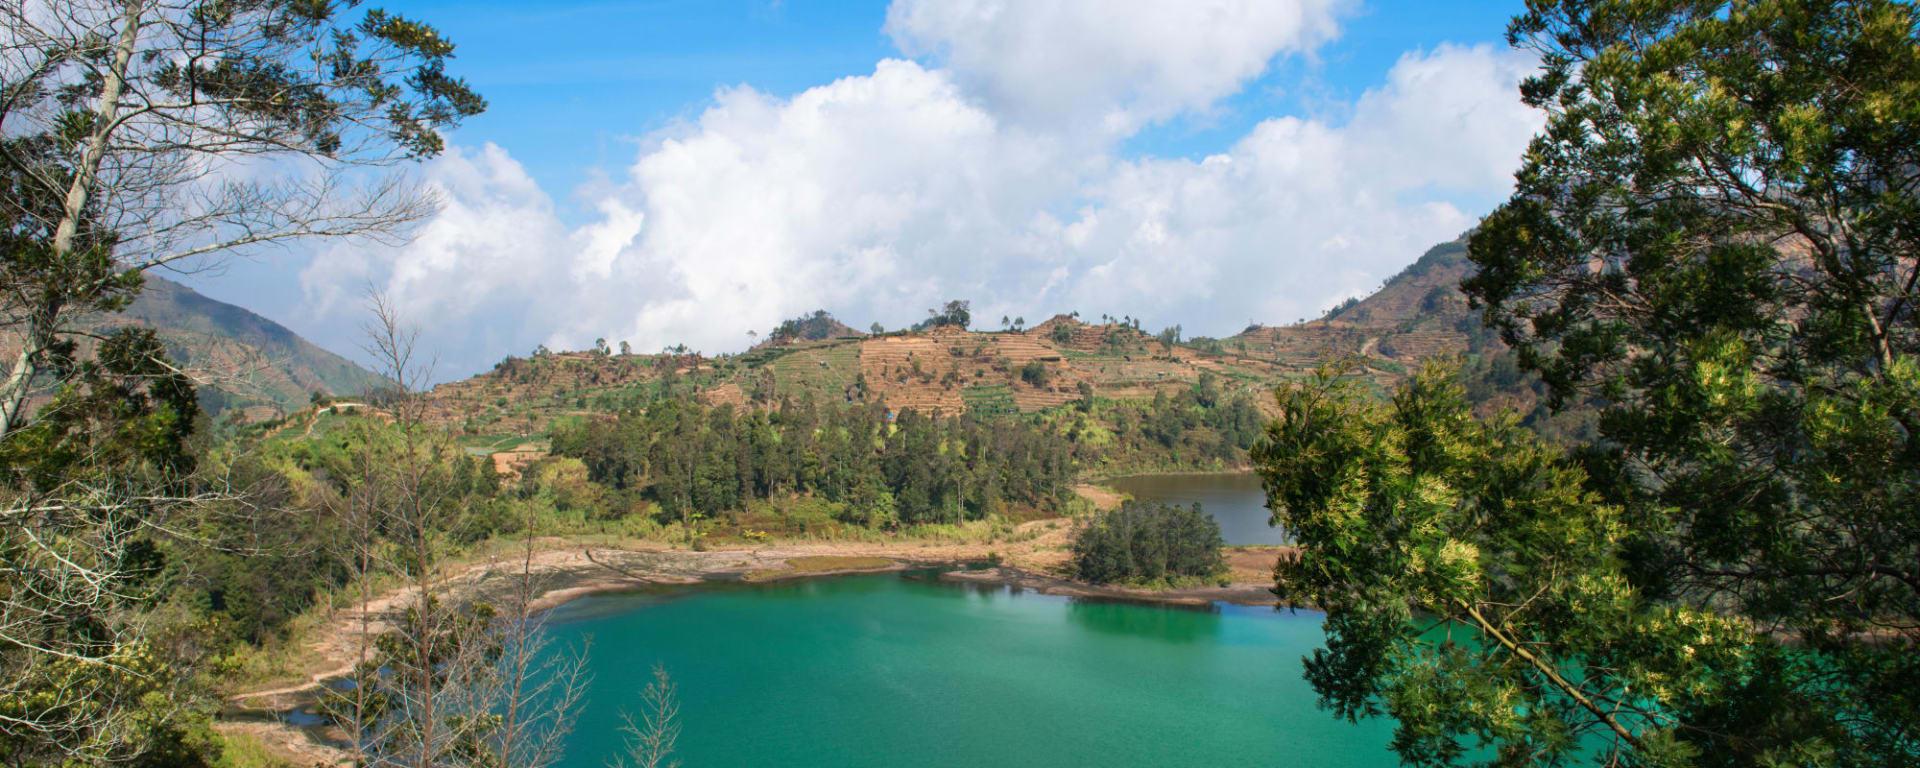 Entdeckertour Mittel-Java ab Yogyakarta und Umgebung: Indonesien Java Telaga Warna Dieng Plateau